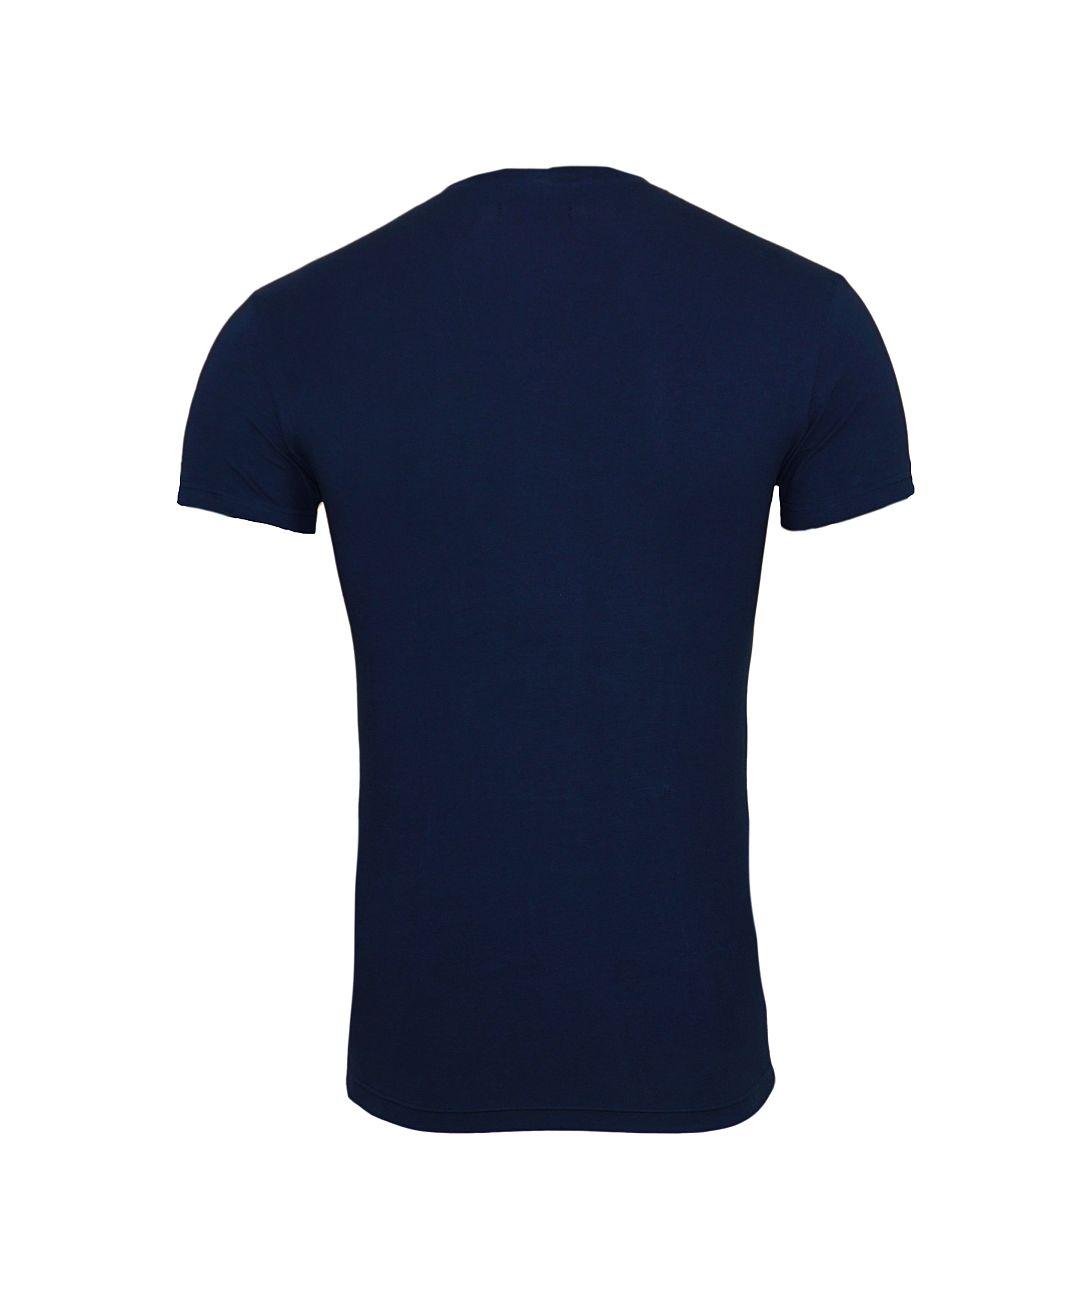 Emporio Armani T-Shirt V-Ausschnitt 110810 8P512 00135 MARINE F18-EAT1